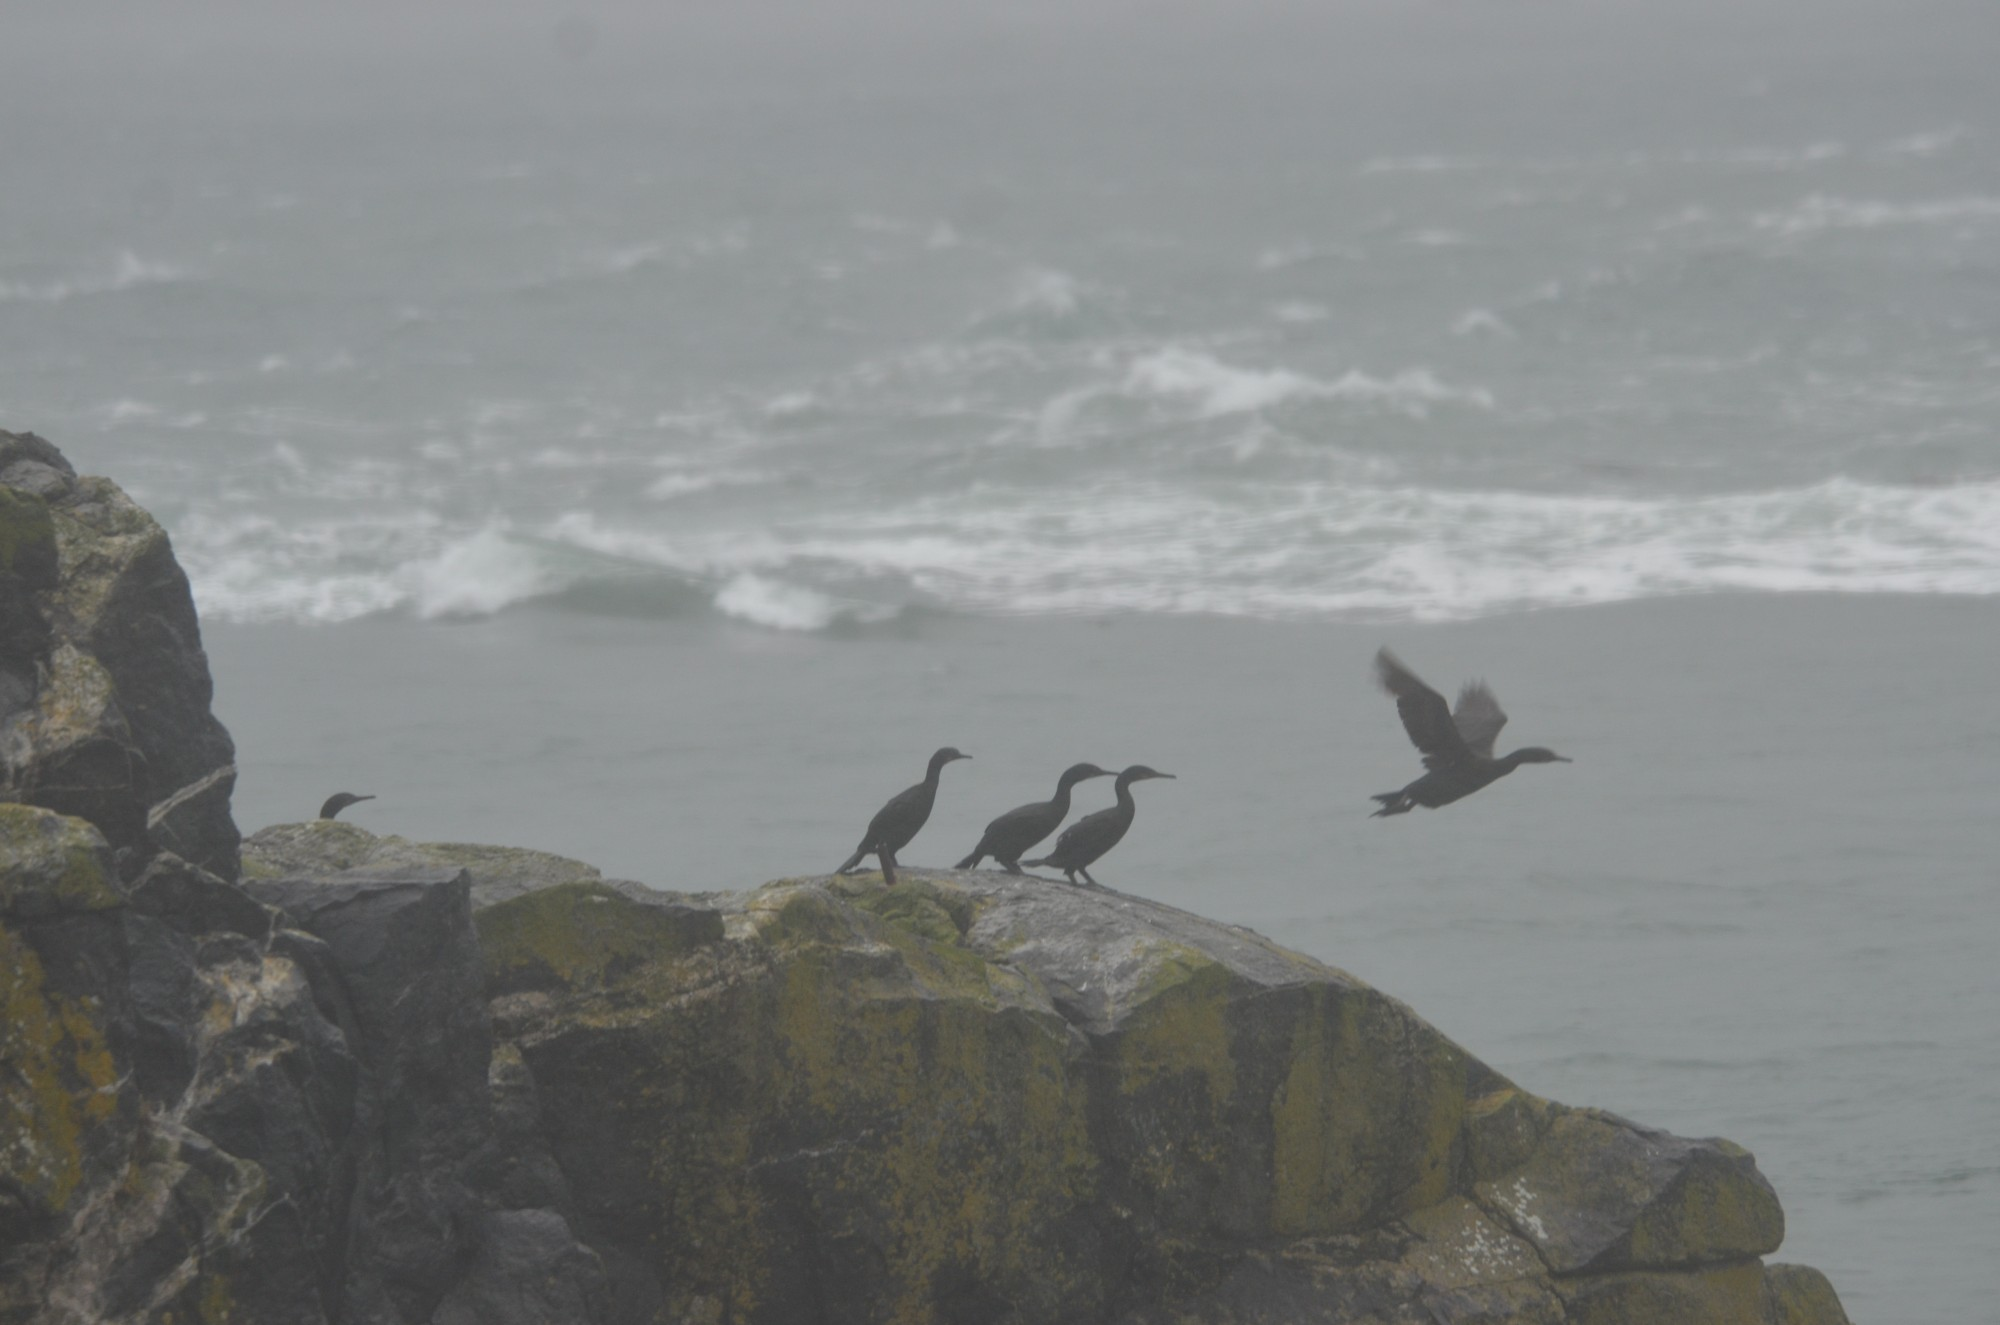 Brandt's Cormorants making a break for more sheltered area